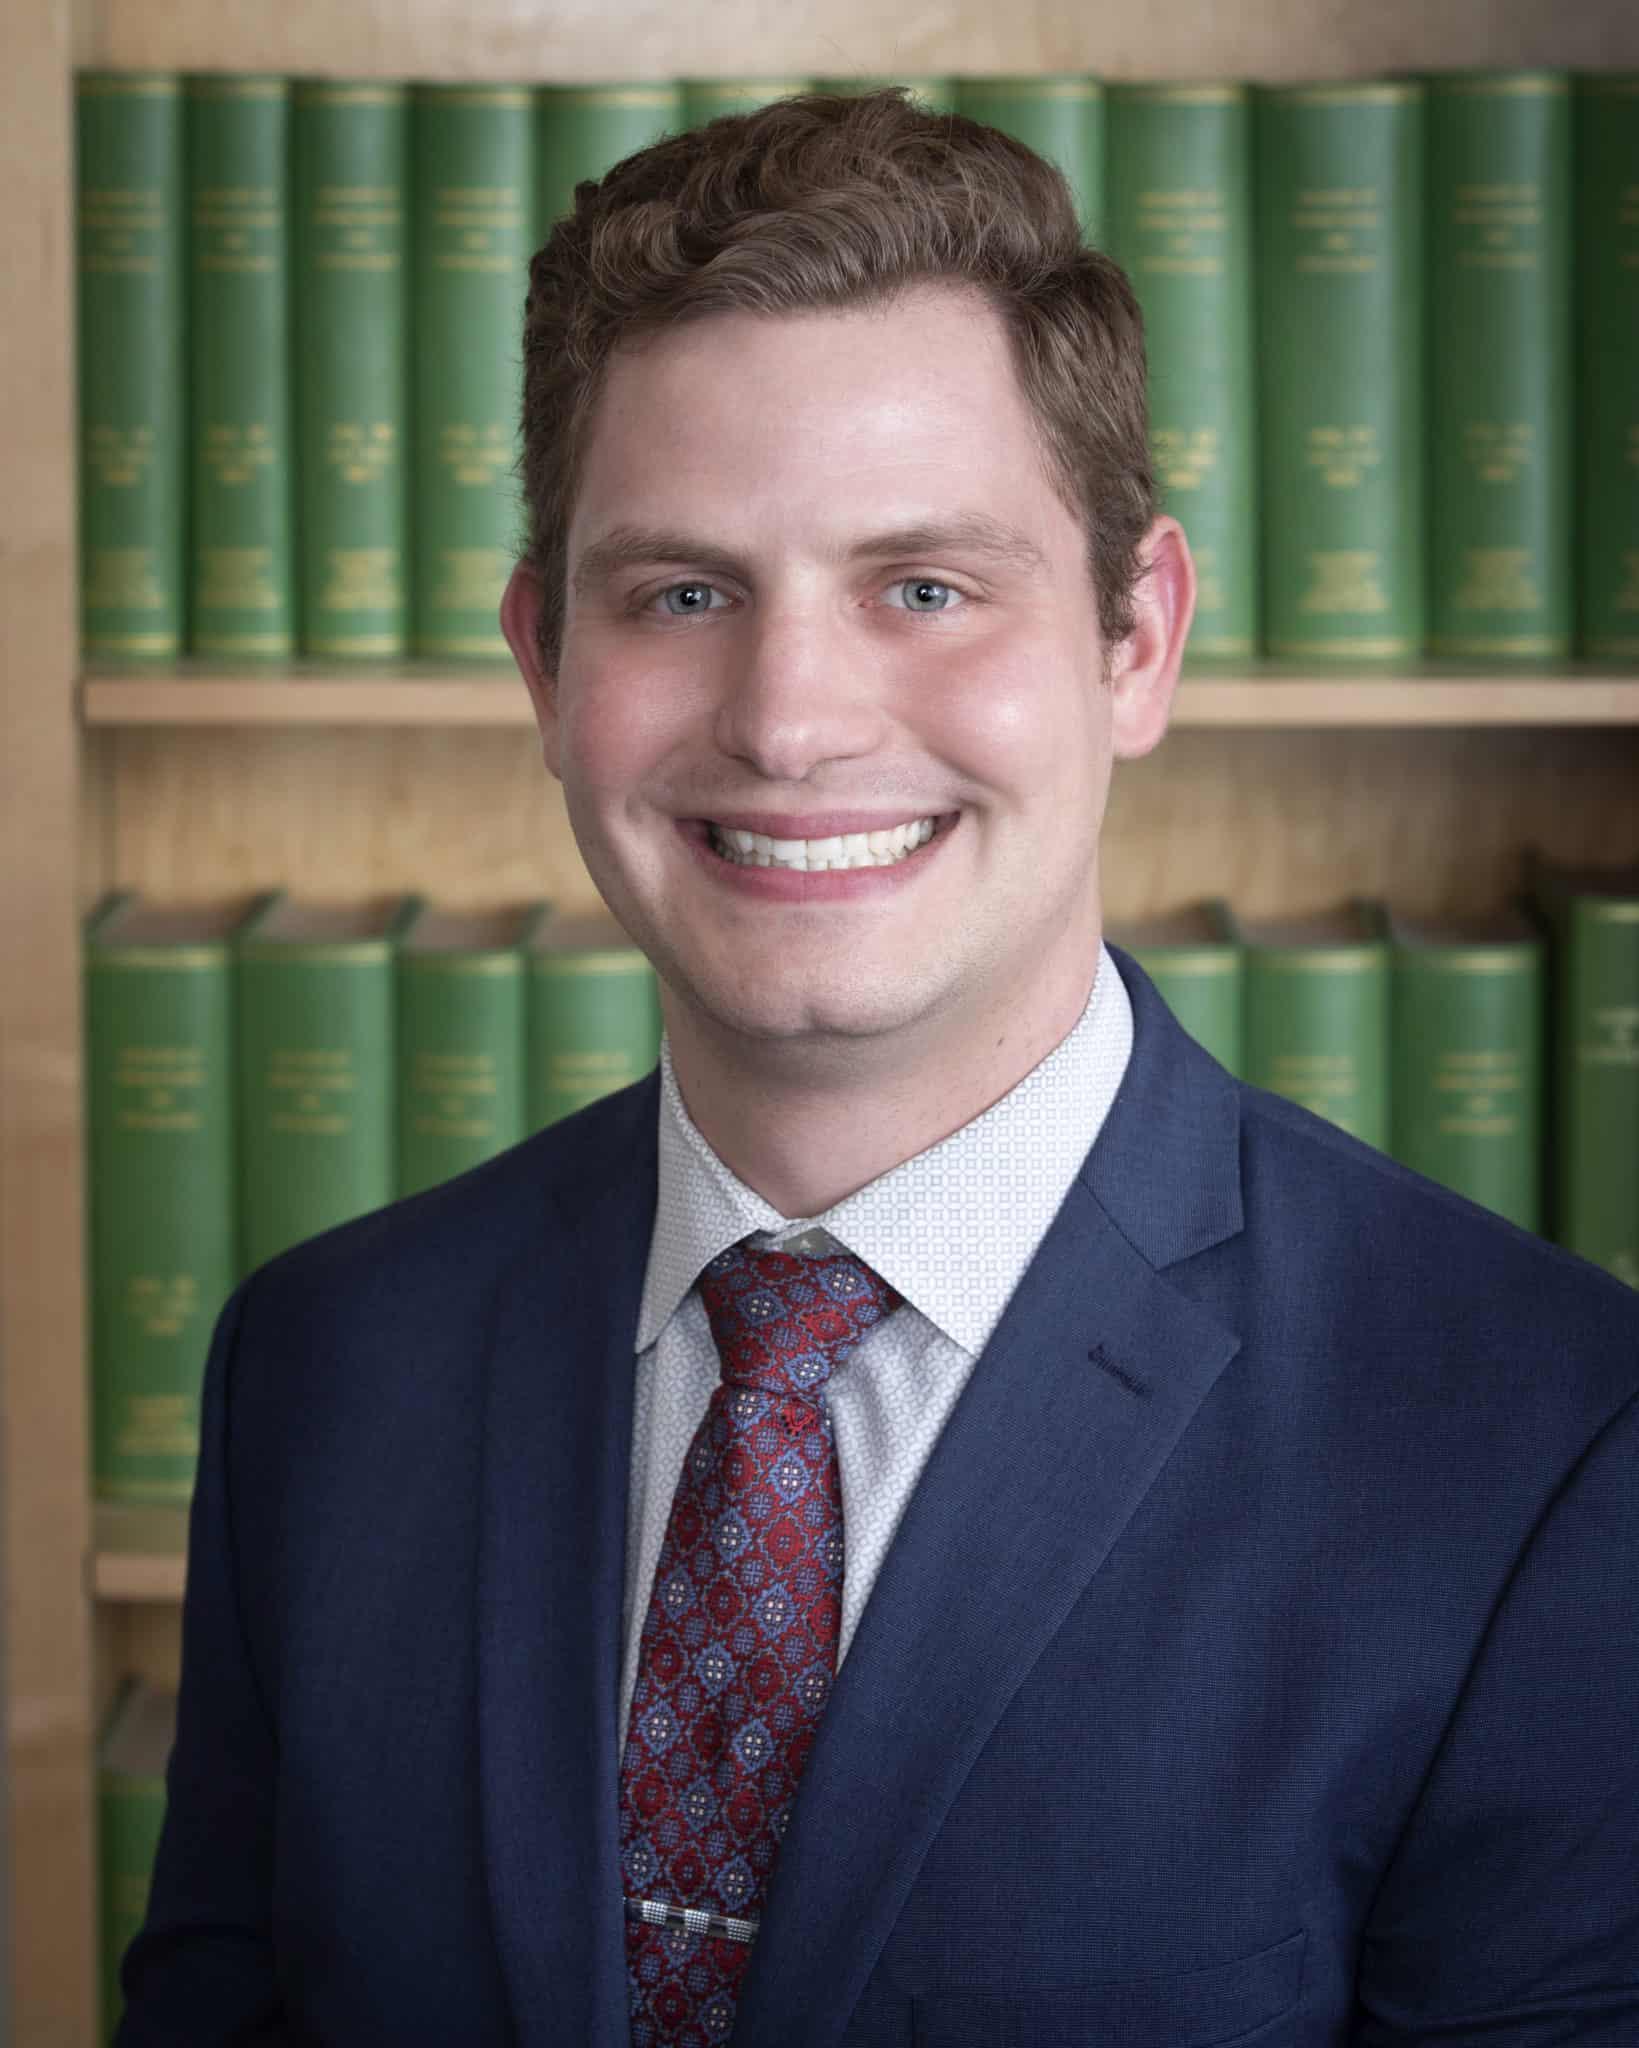 Stephen Matlock